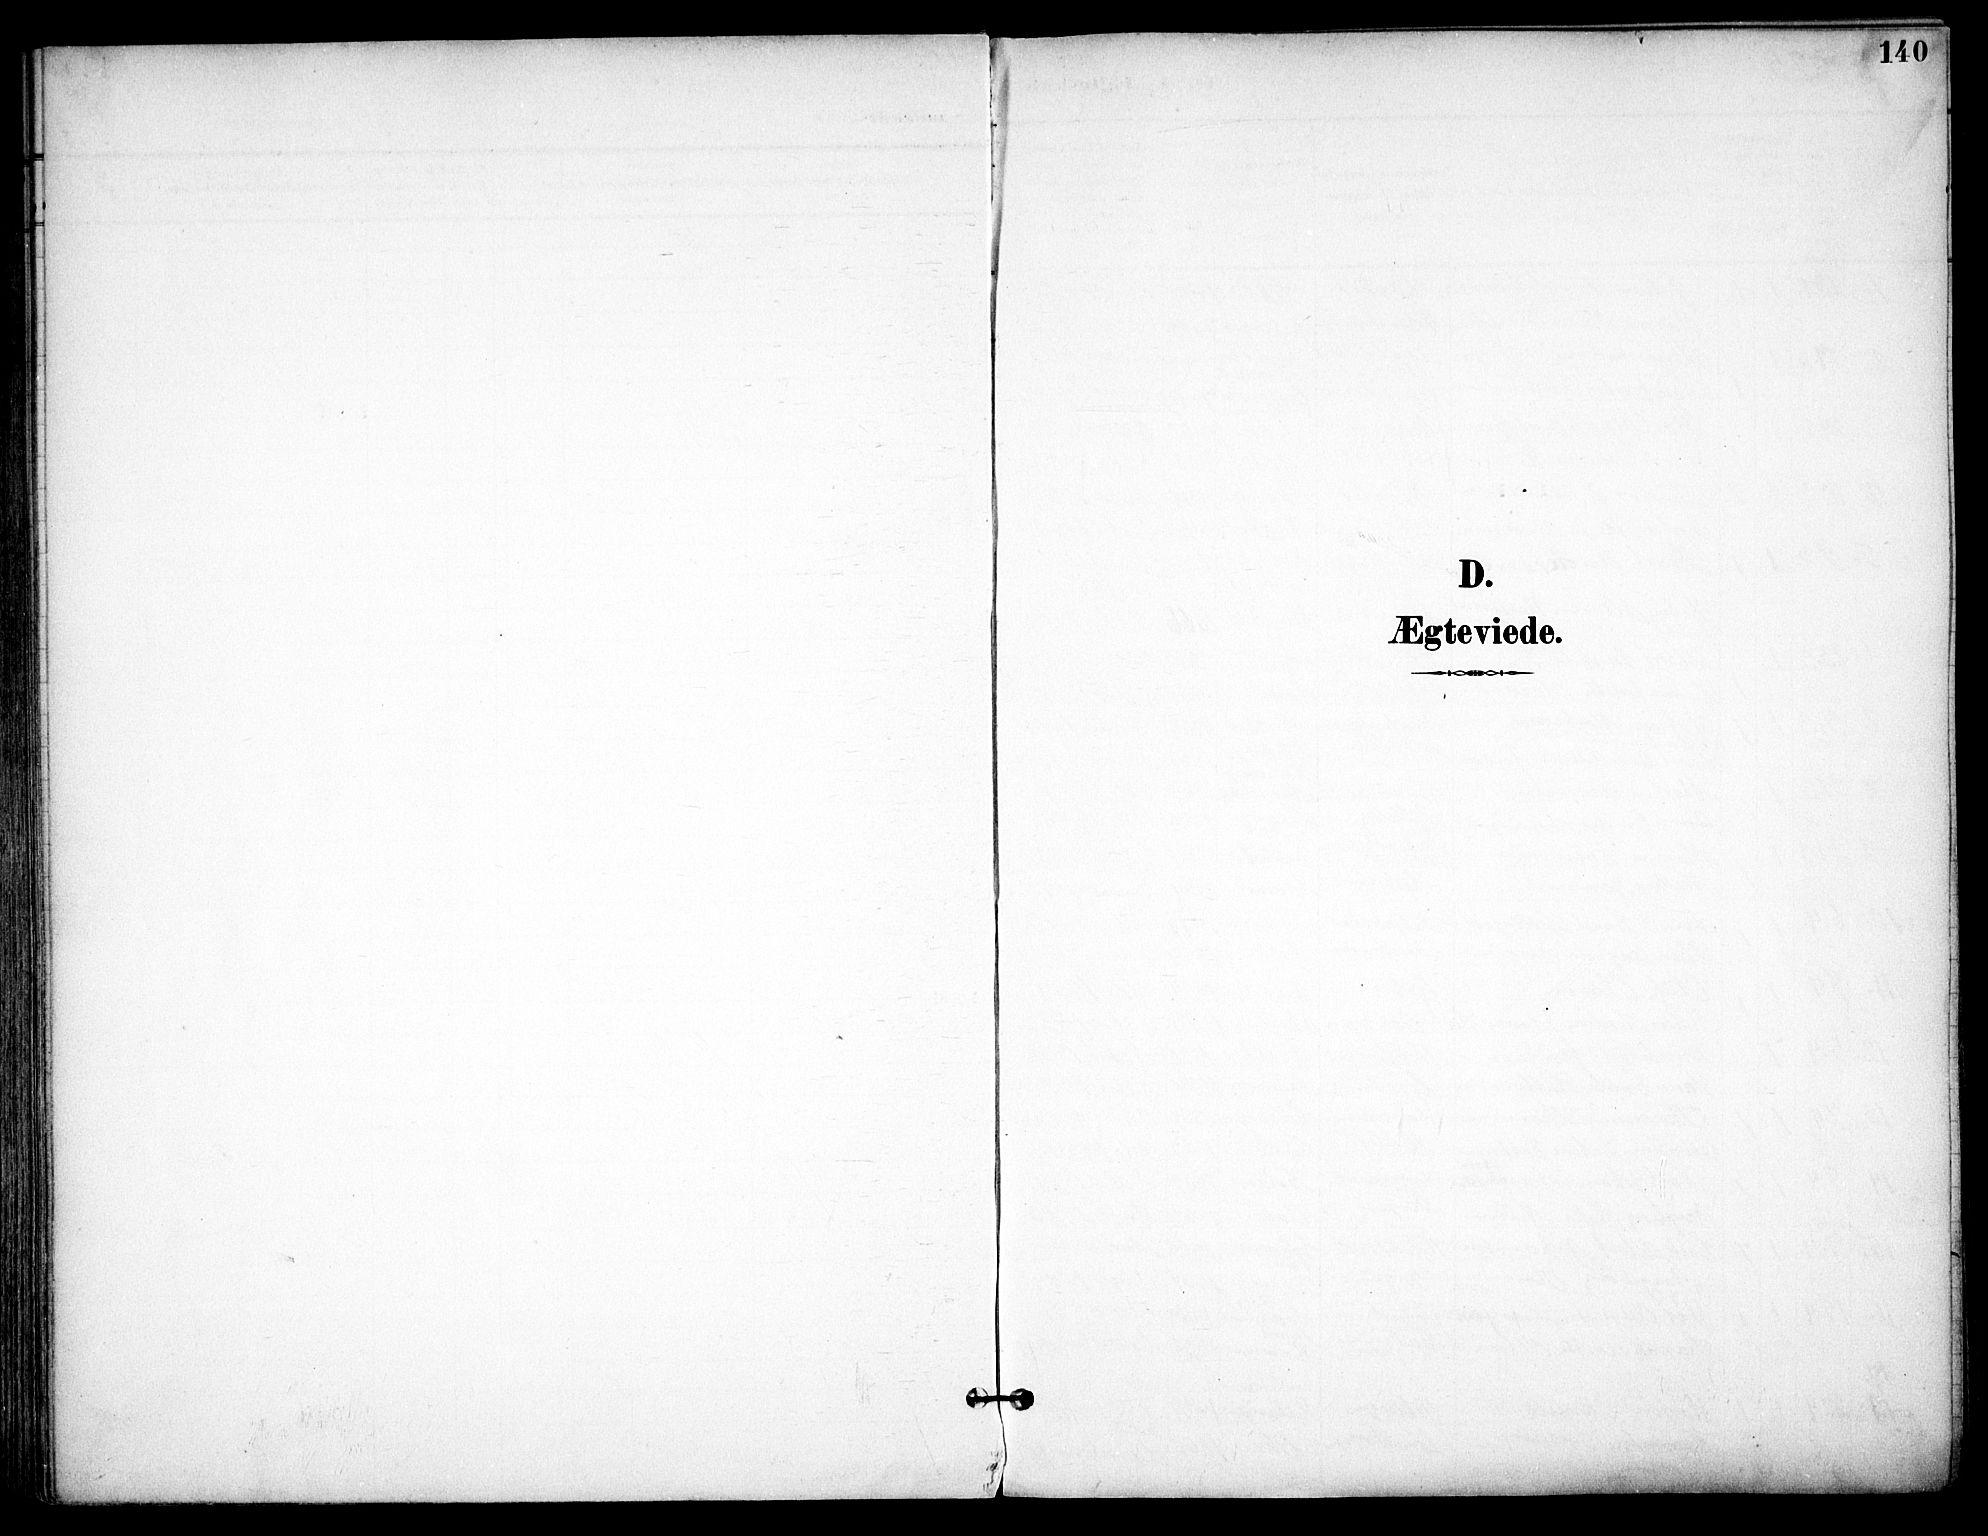 SAO, Østre Aker prestekontor Kirkebøker, F/Fa/L0011: Ministerialbok nr. I 11, 1895-1917, s. 140